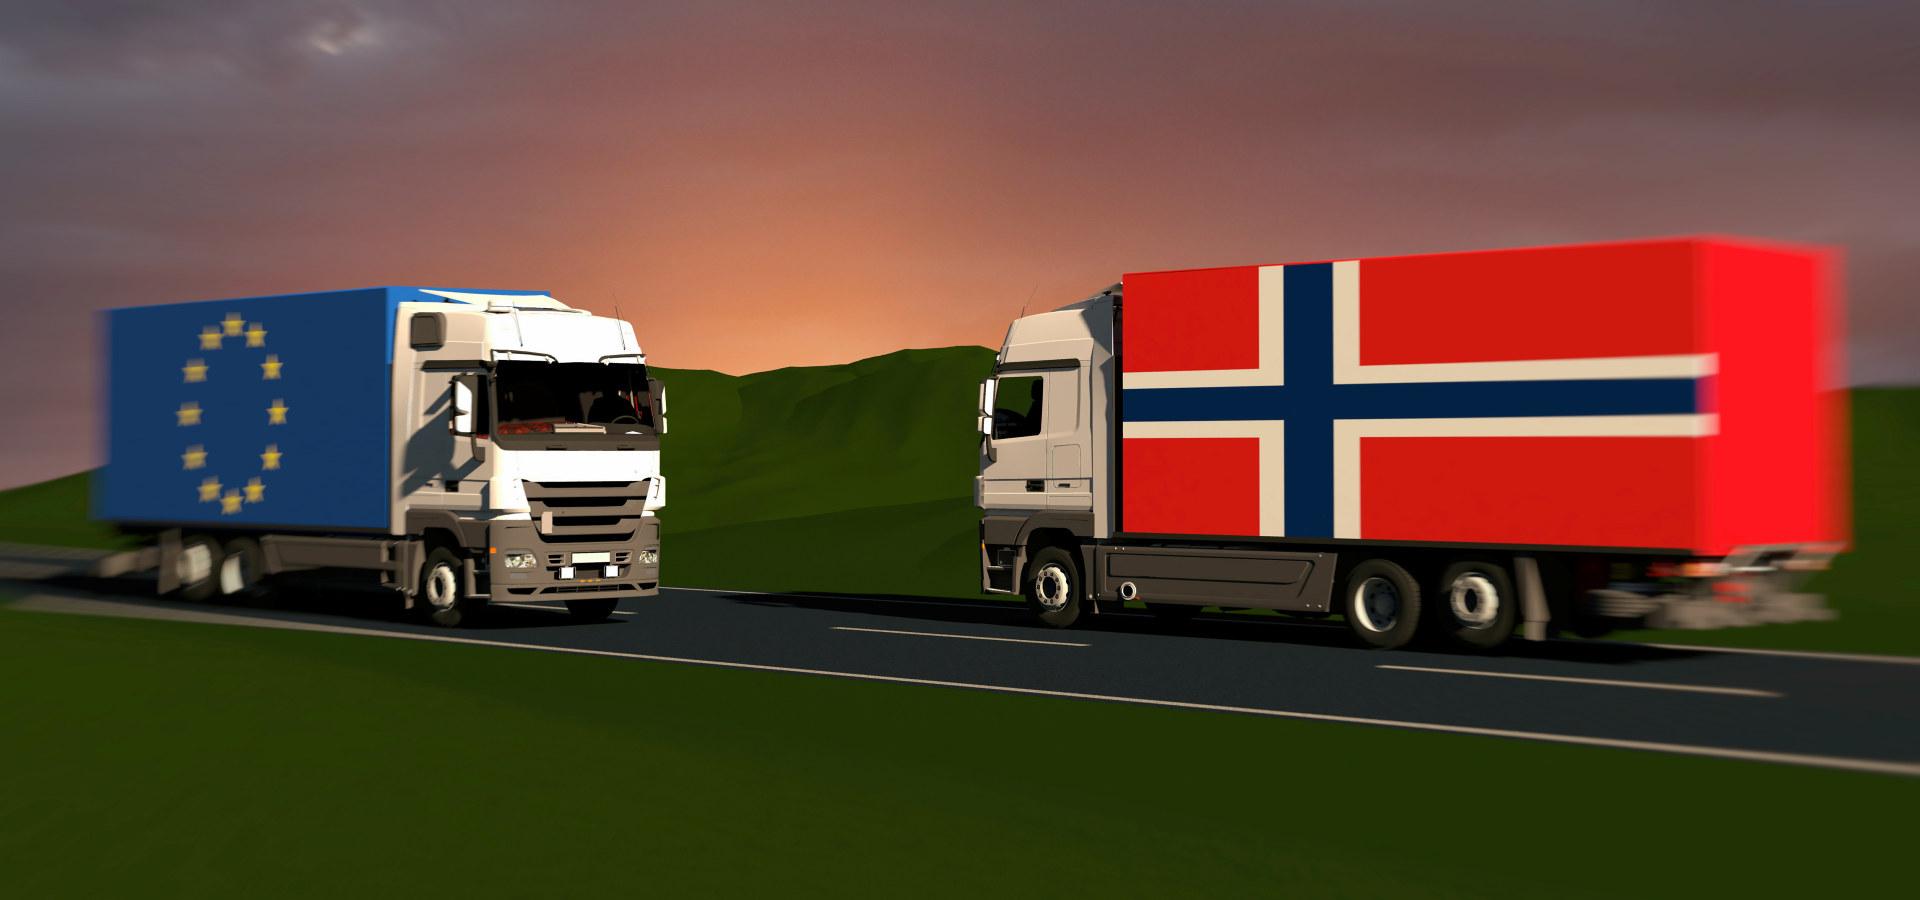 EU - eksport, import, transport